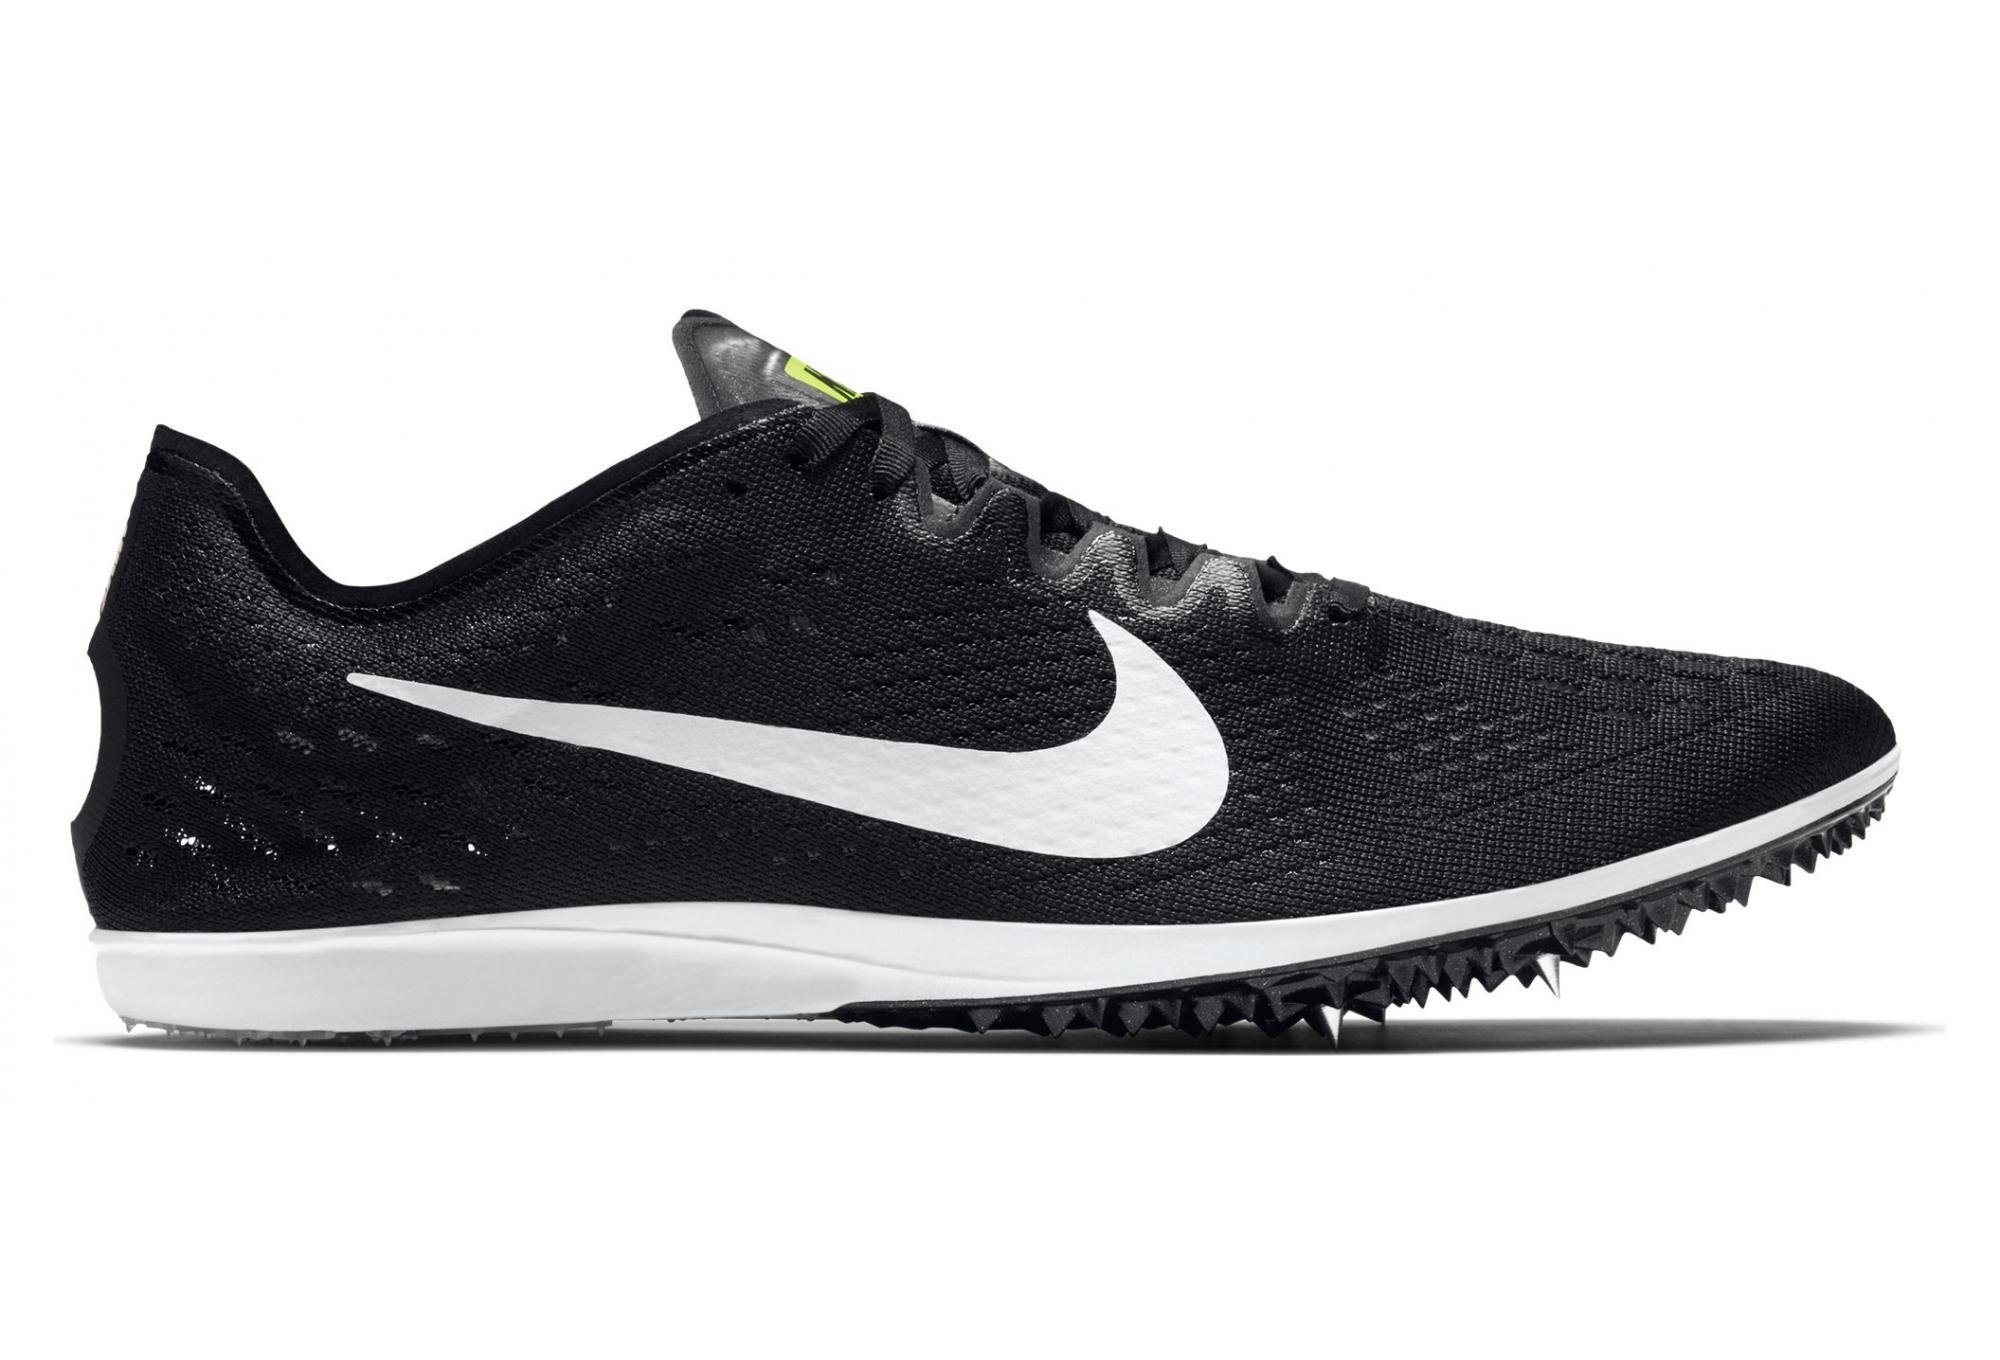 online store 28b65 e4b95 Nike Zoom Matumbo 3 Black White Unisex